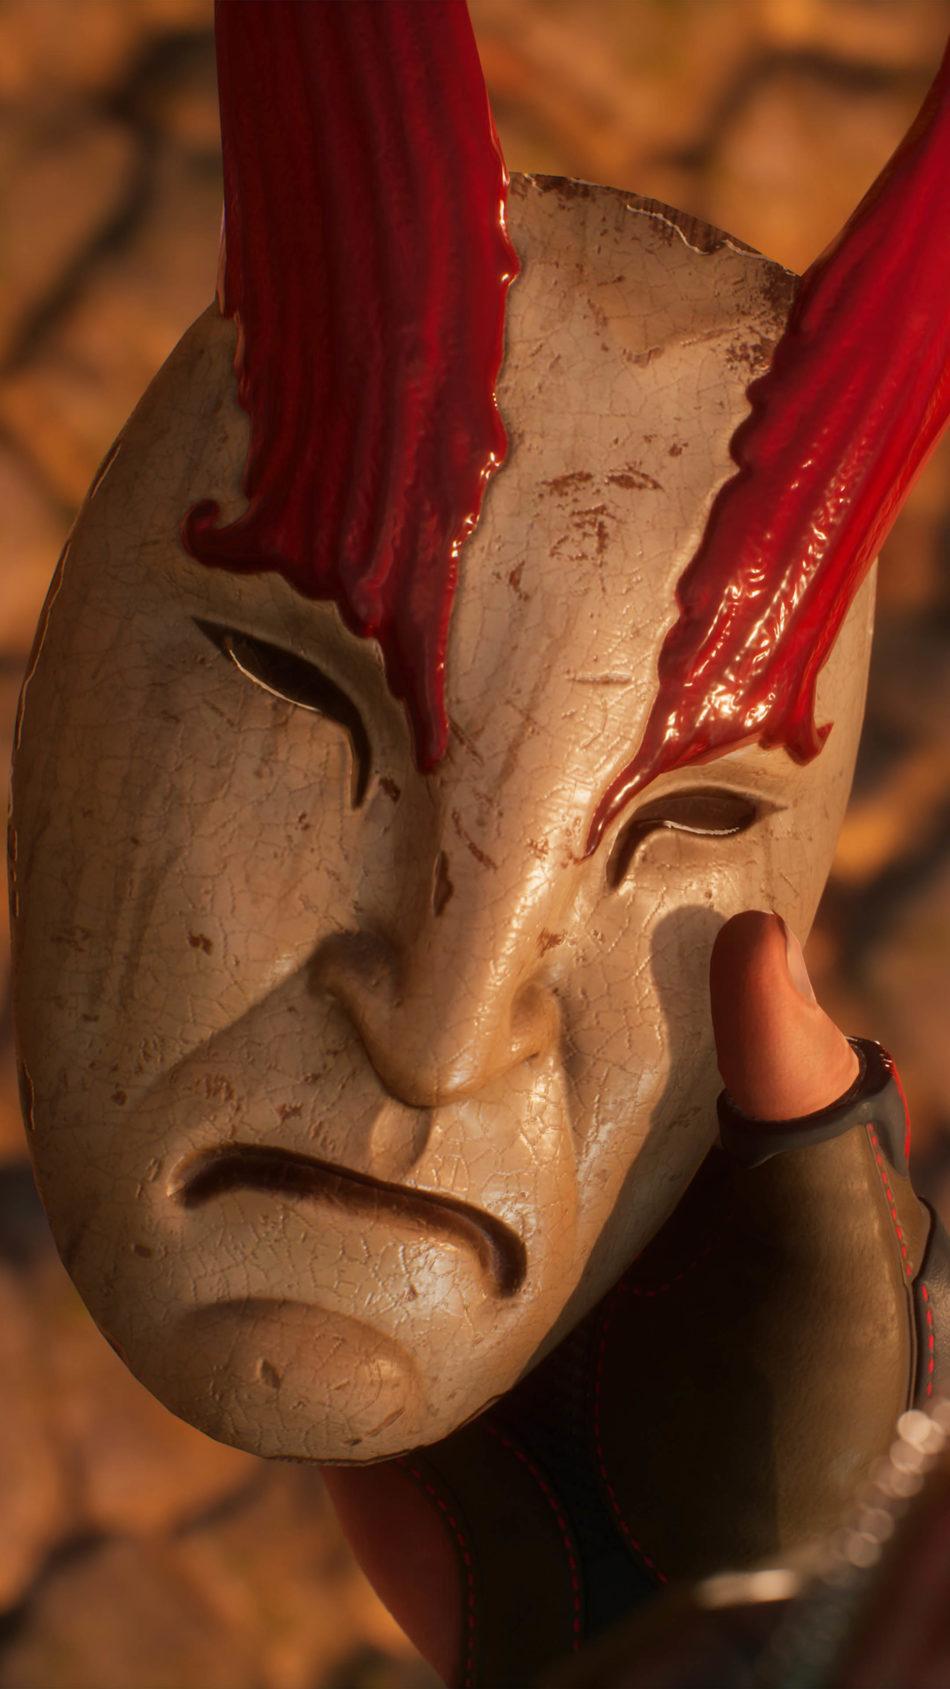 Shadow Warrior 3 Game Mask 4K Ultra HD Mobile Wallpaper